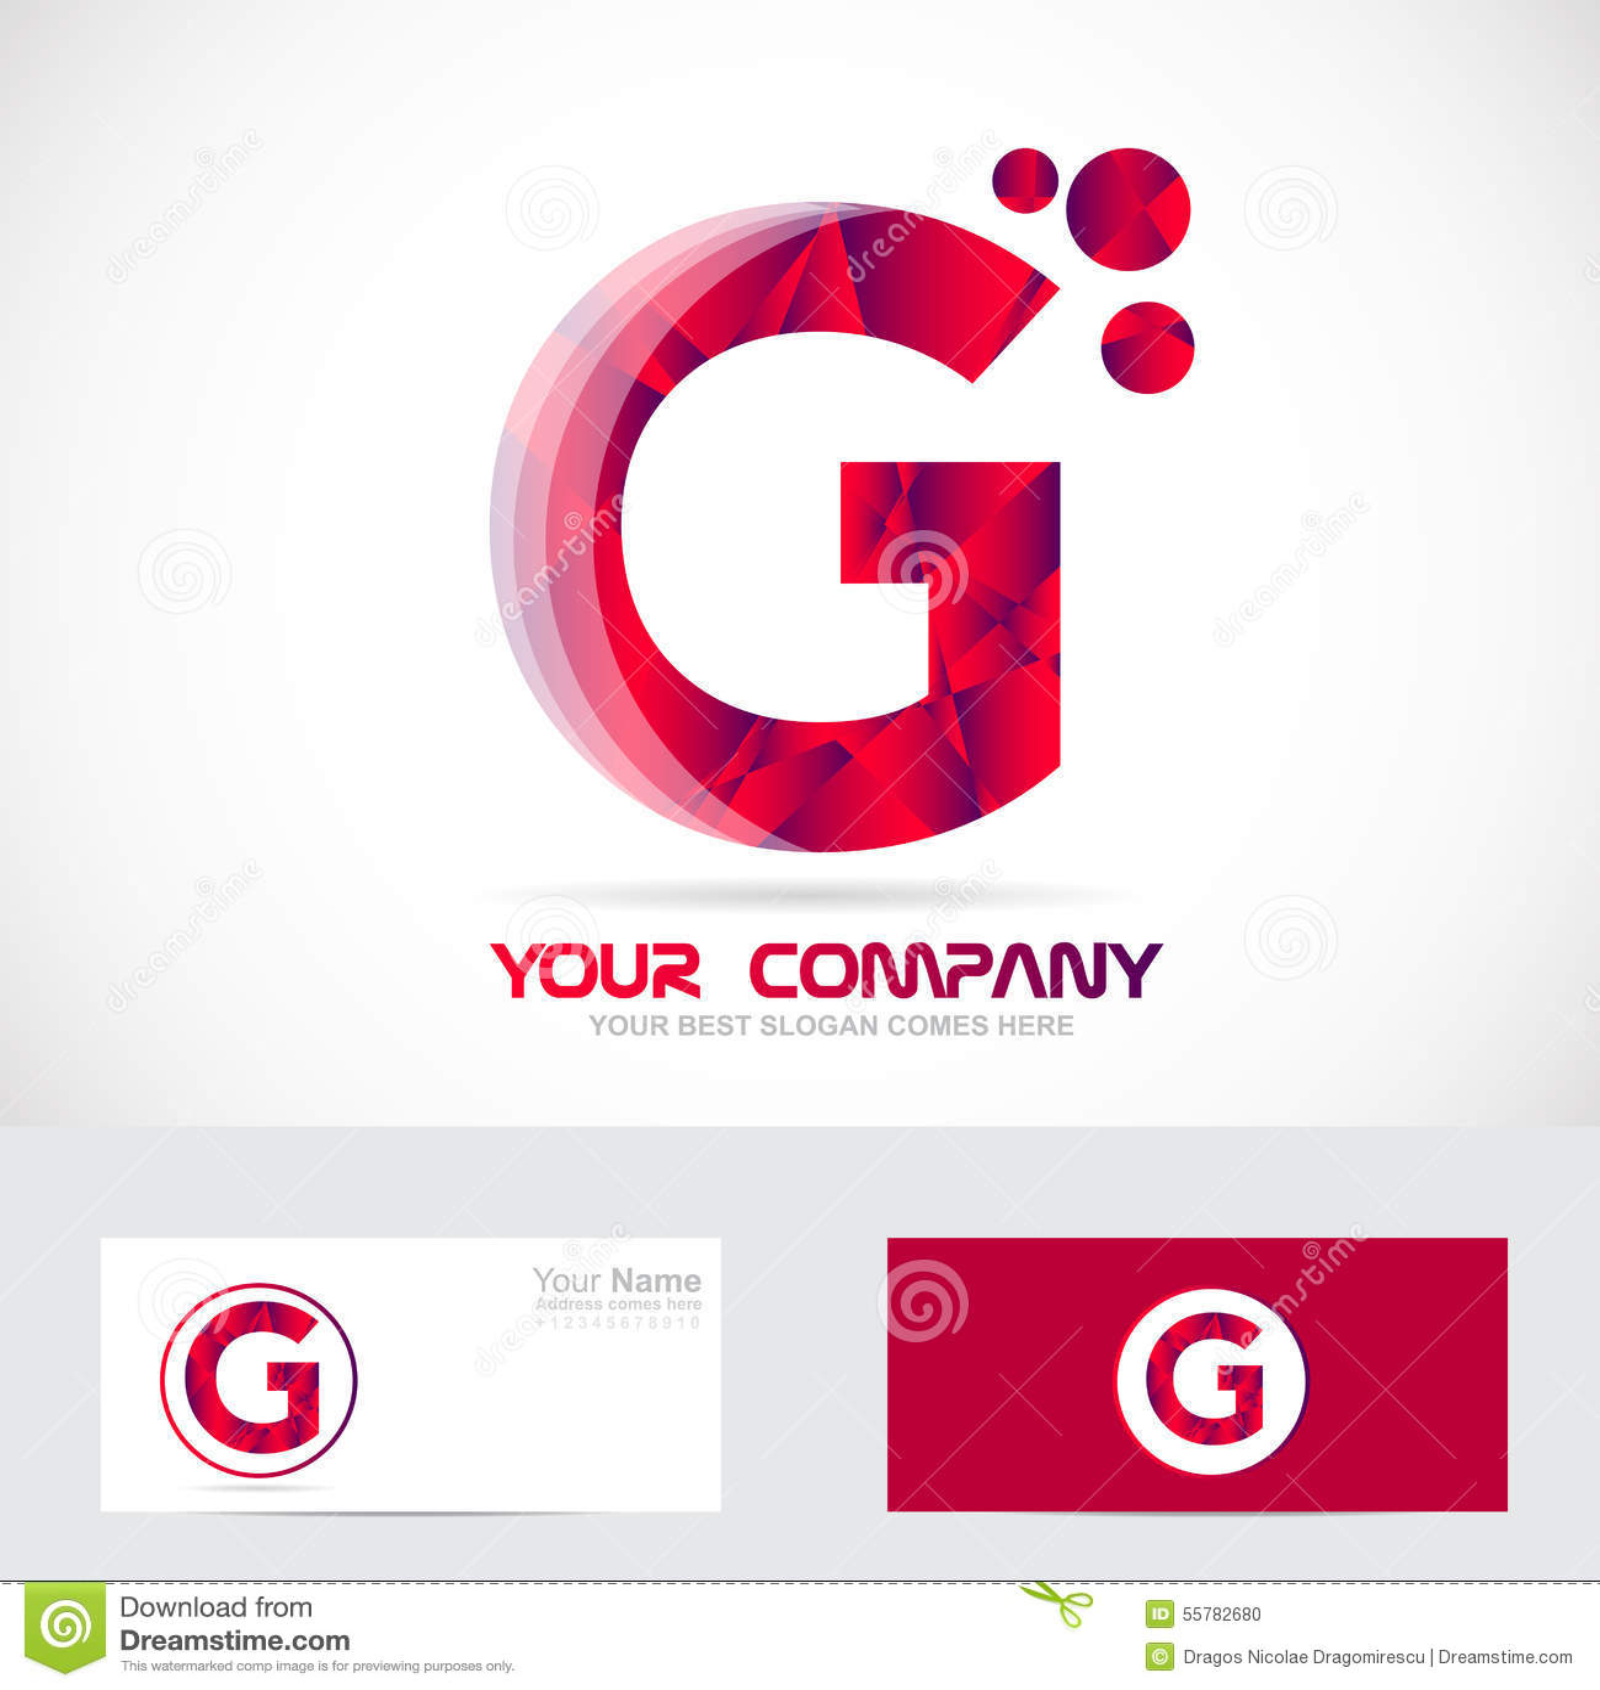 G красного цвета